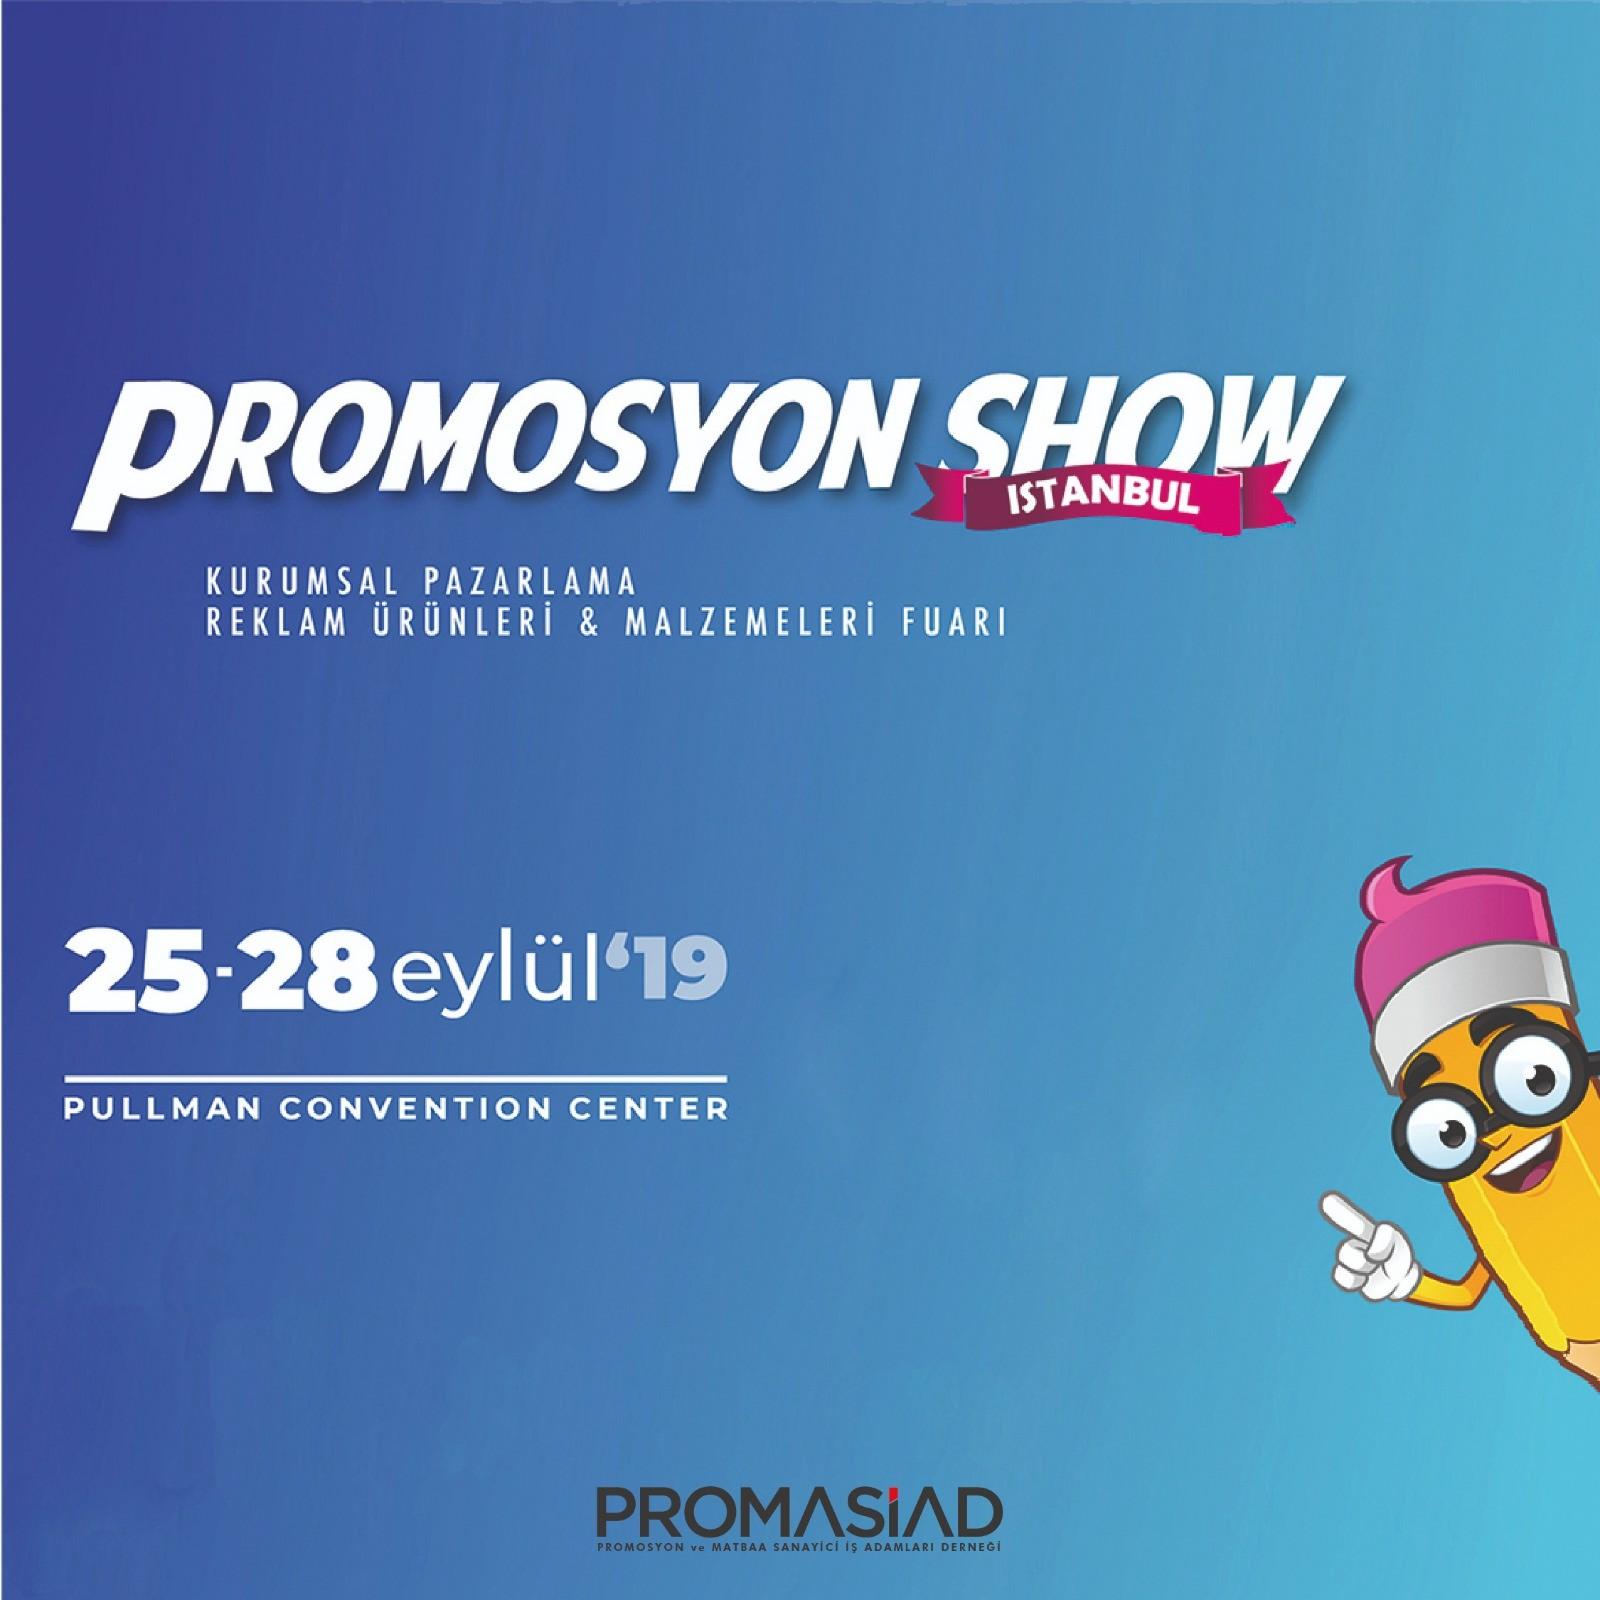 3. Promosyon Show İstanbul